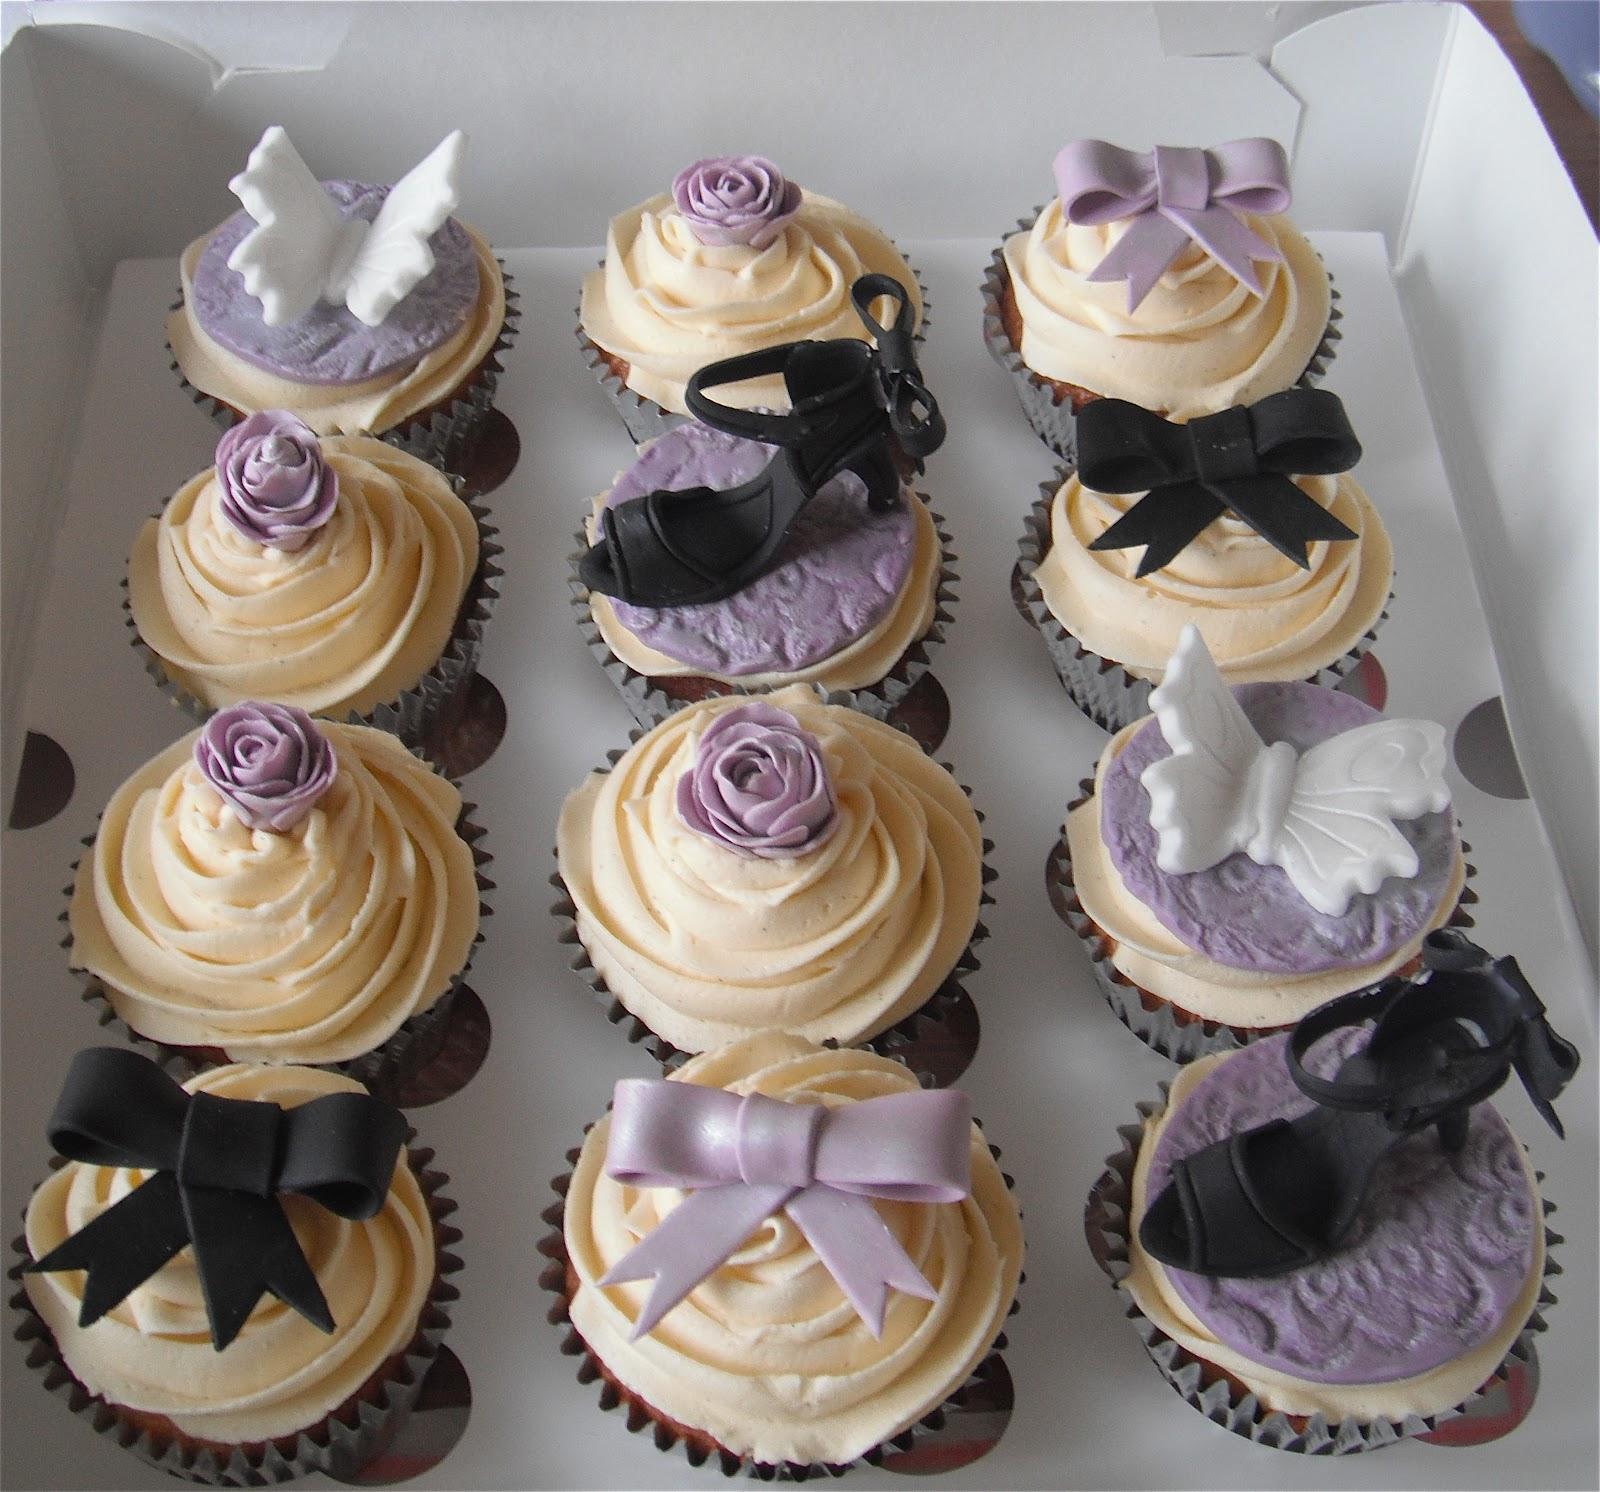 Sugar Ruffles Elegant Wedding Cakes Barrow in Furness and the